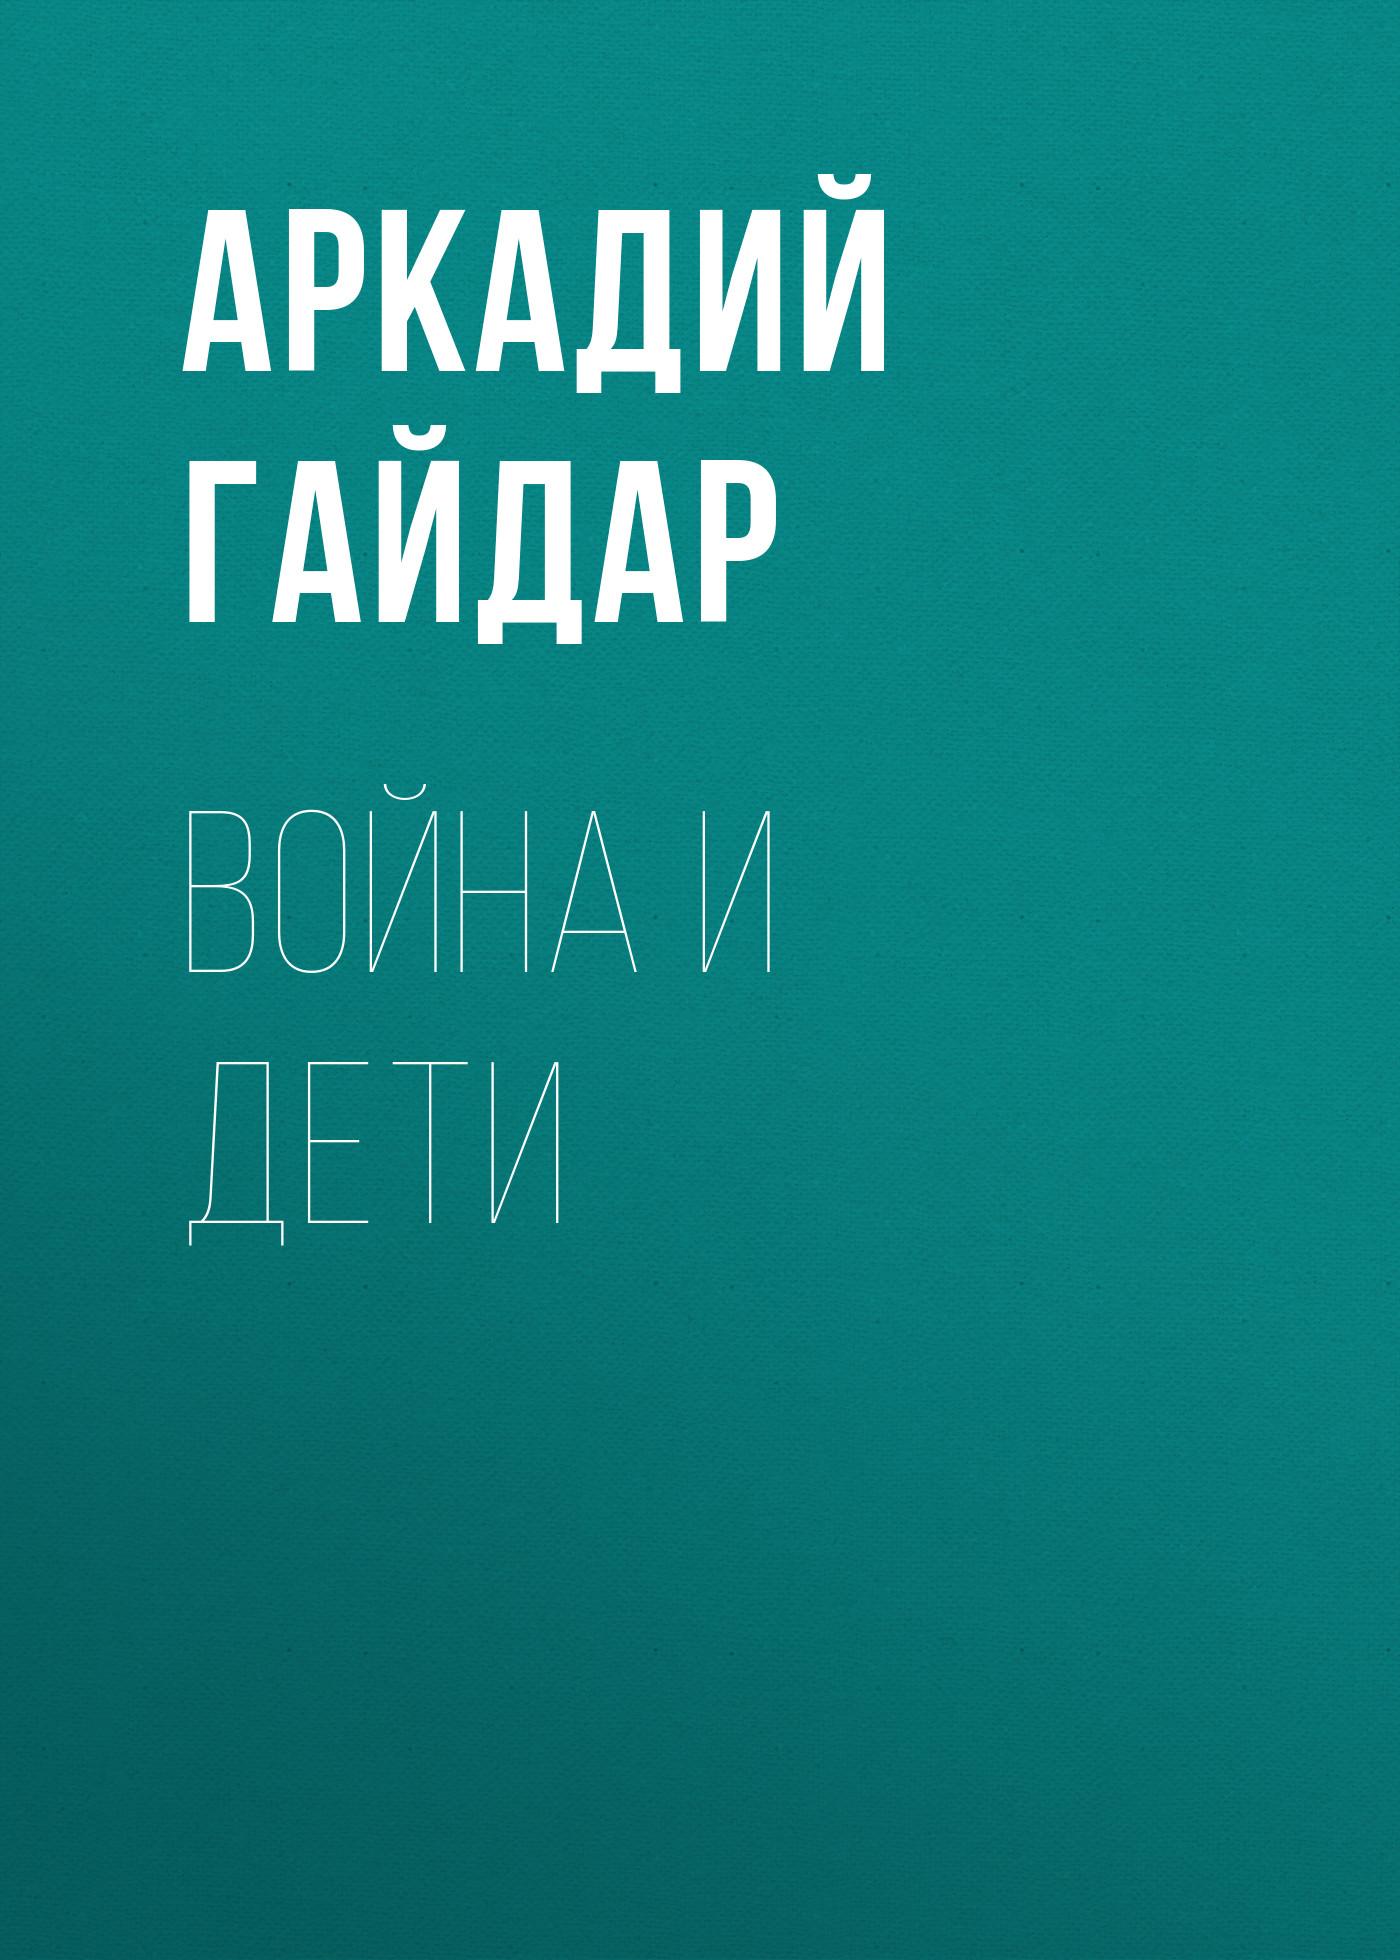 цена на Аркадий Гайдар Война и дети